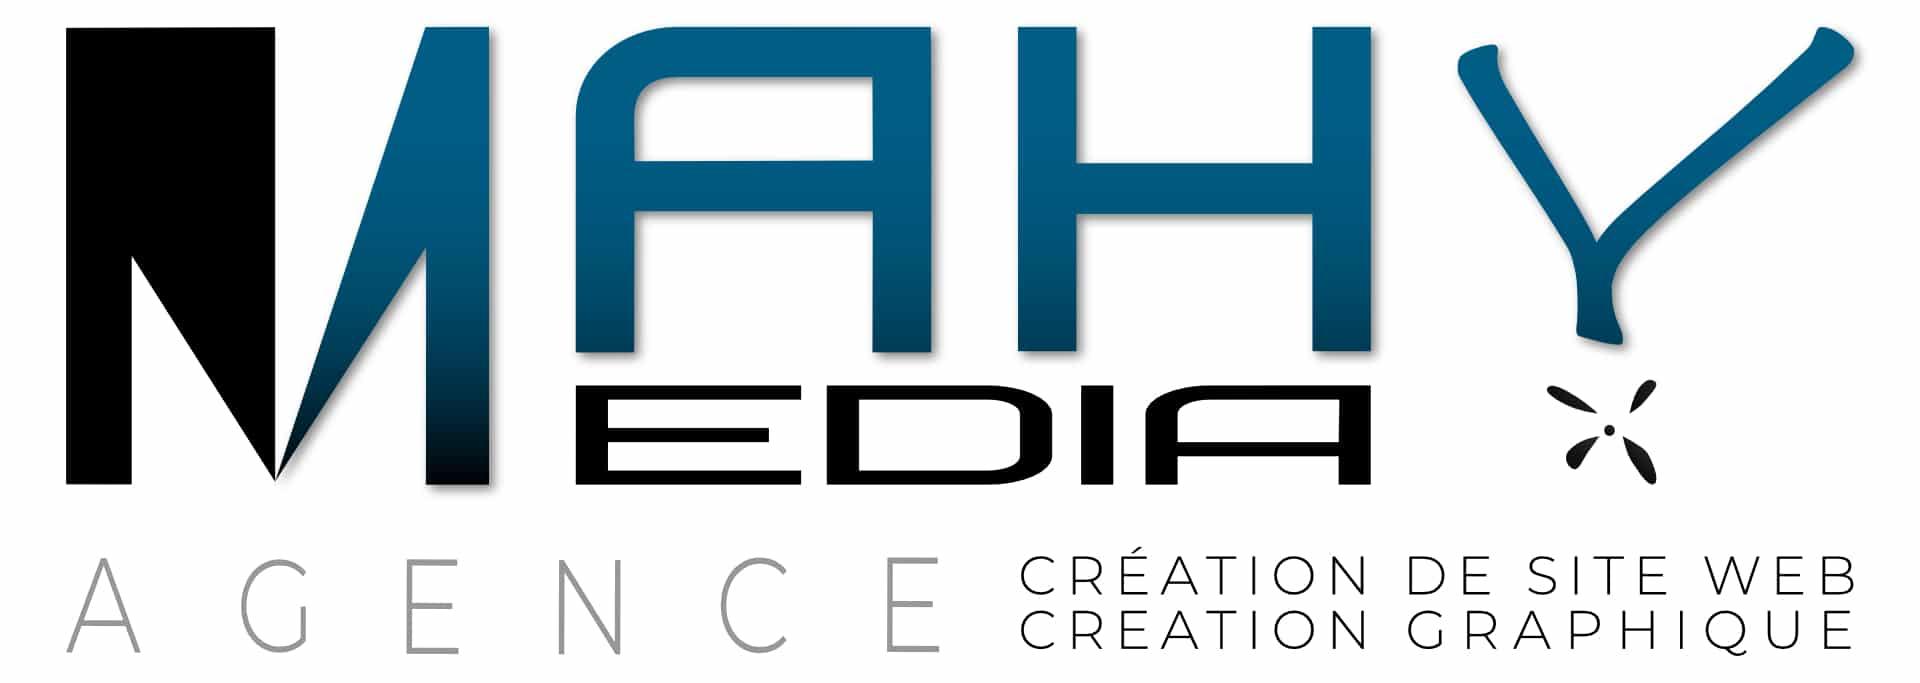 Logo de l'agence de création de site web Mahymedia